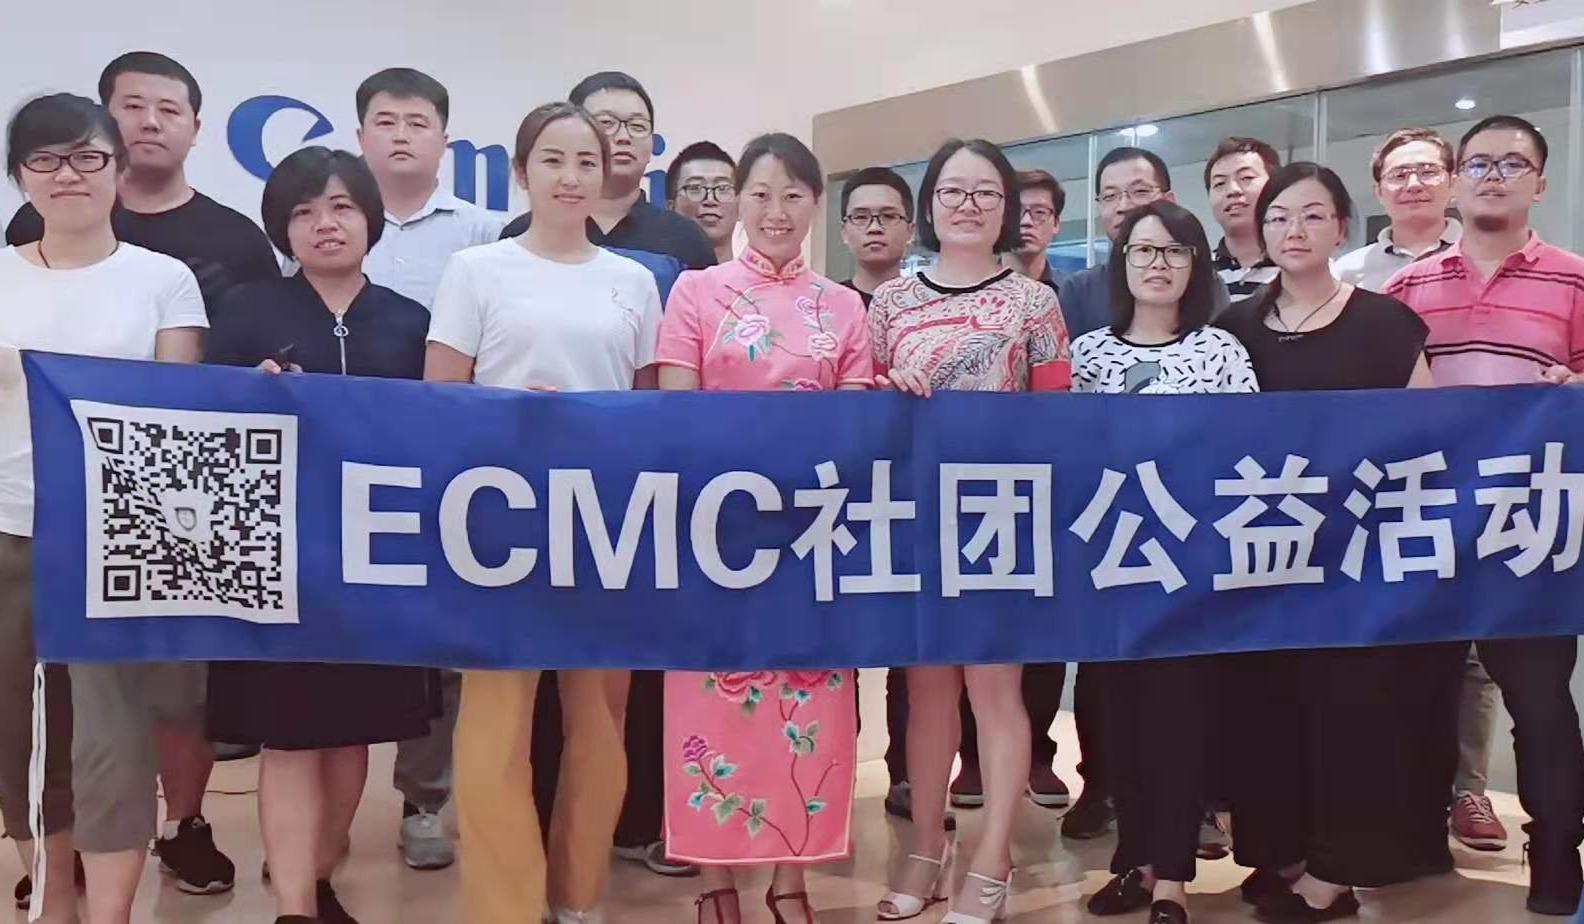 6sigma黑带考试杭州辅导公益活动|拼多多版